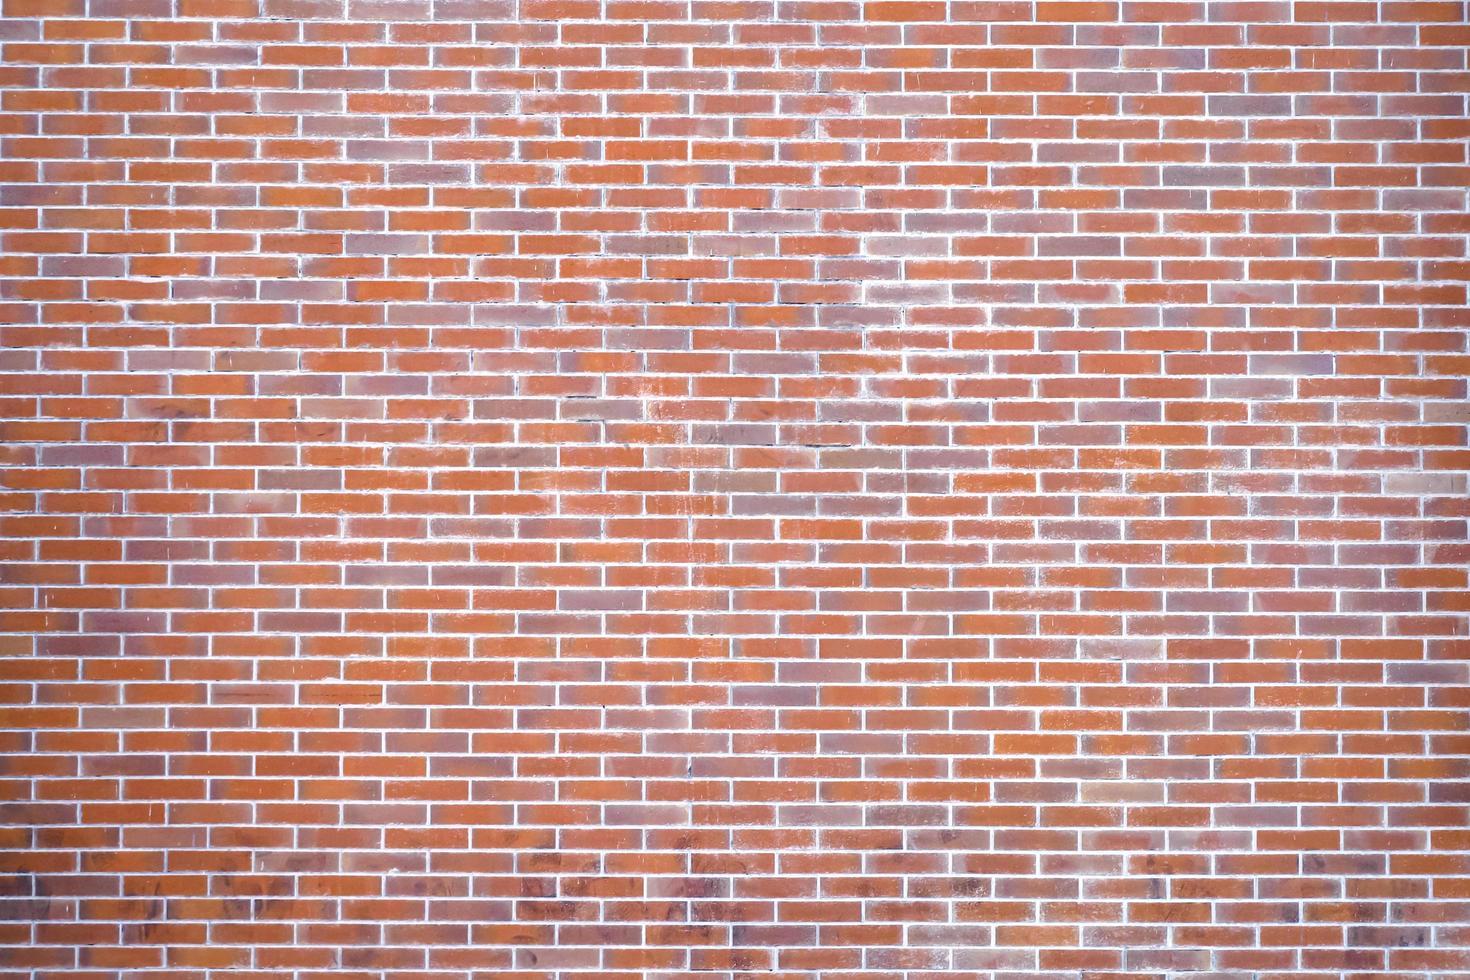 Orange and red brick wall photo